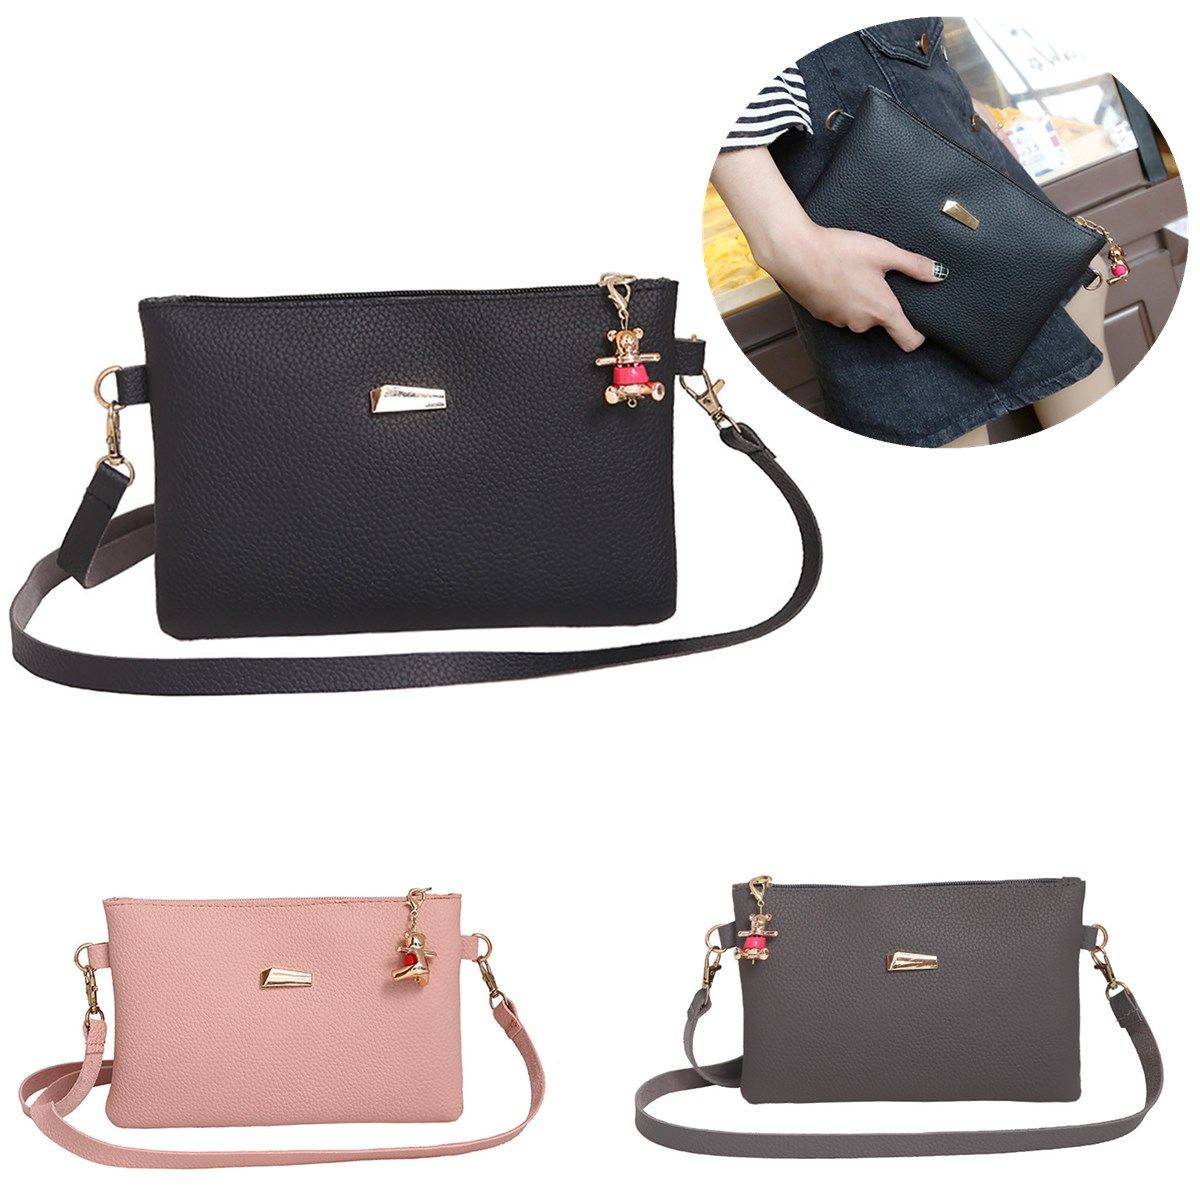 Online Get Cheap Cute Clutch Bags -Aliexpress.com | Alibaba Group